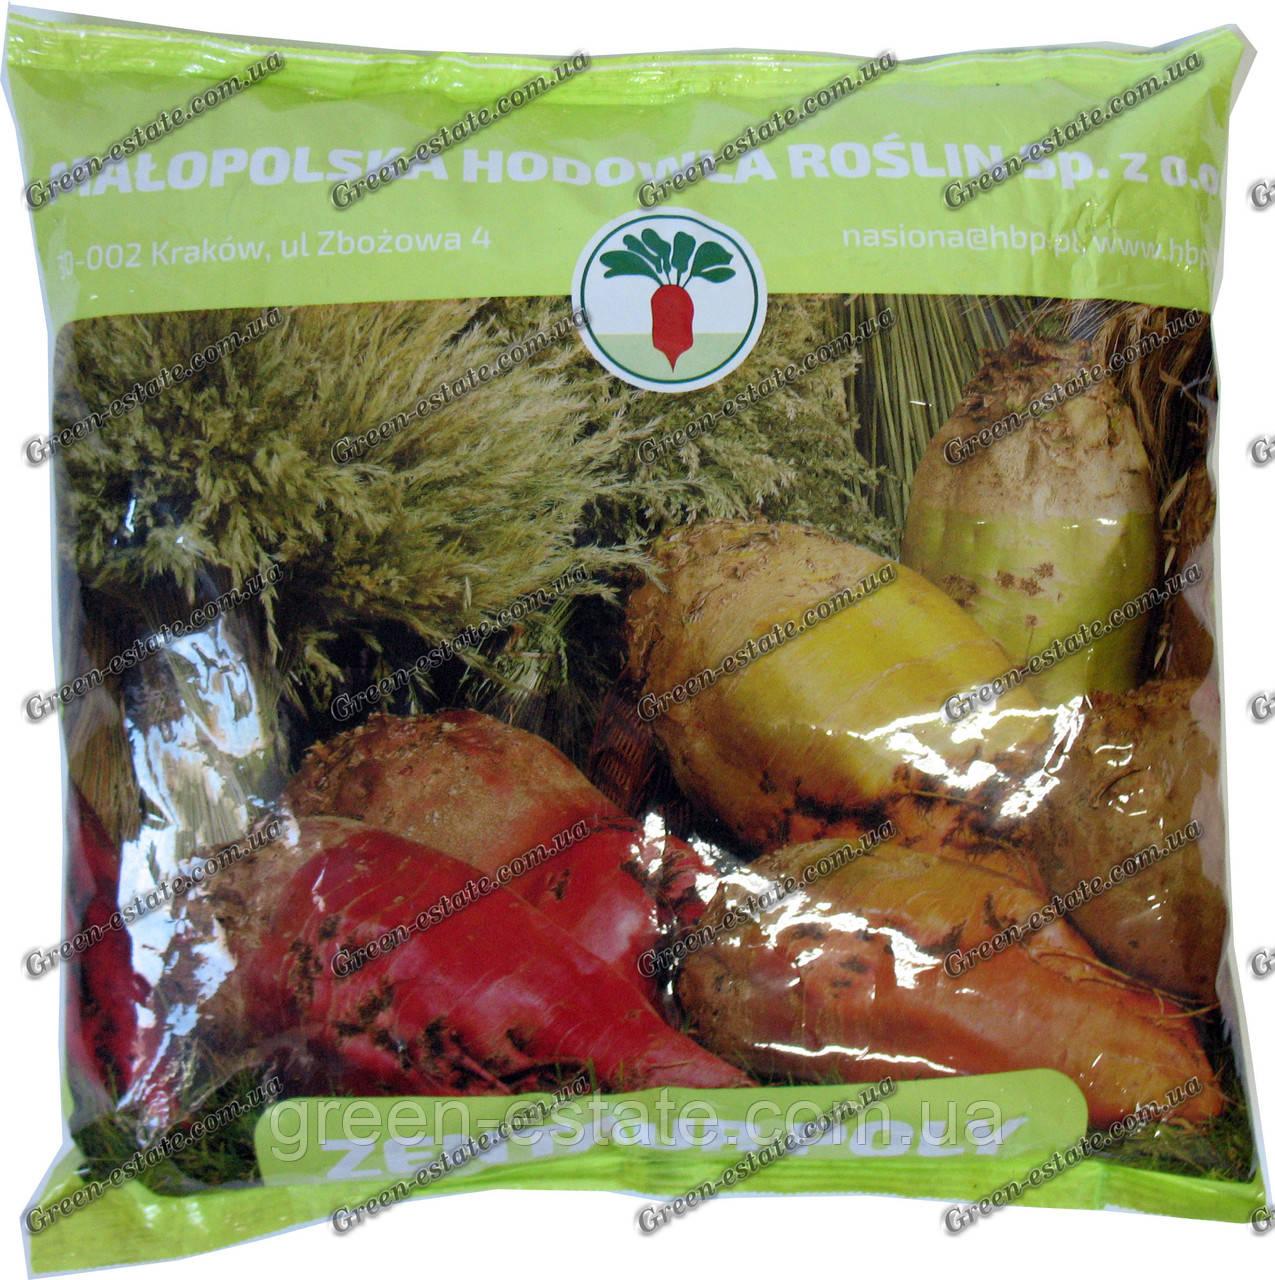 Семена свеклы кормовой Центаур, 1 кг, Польша